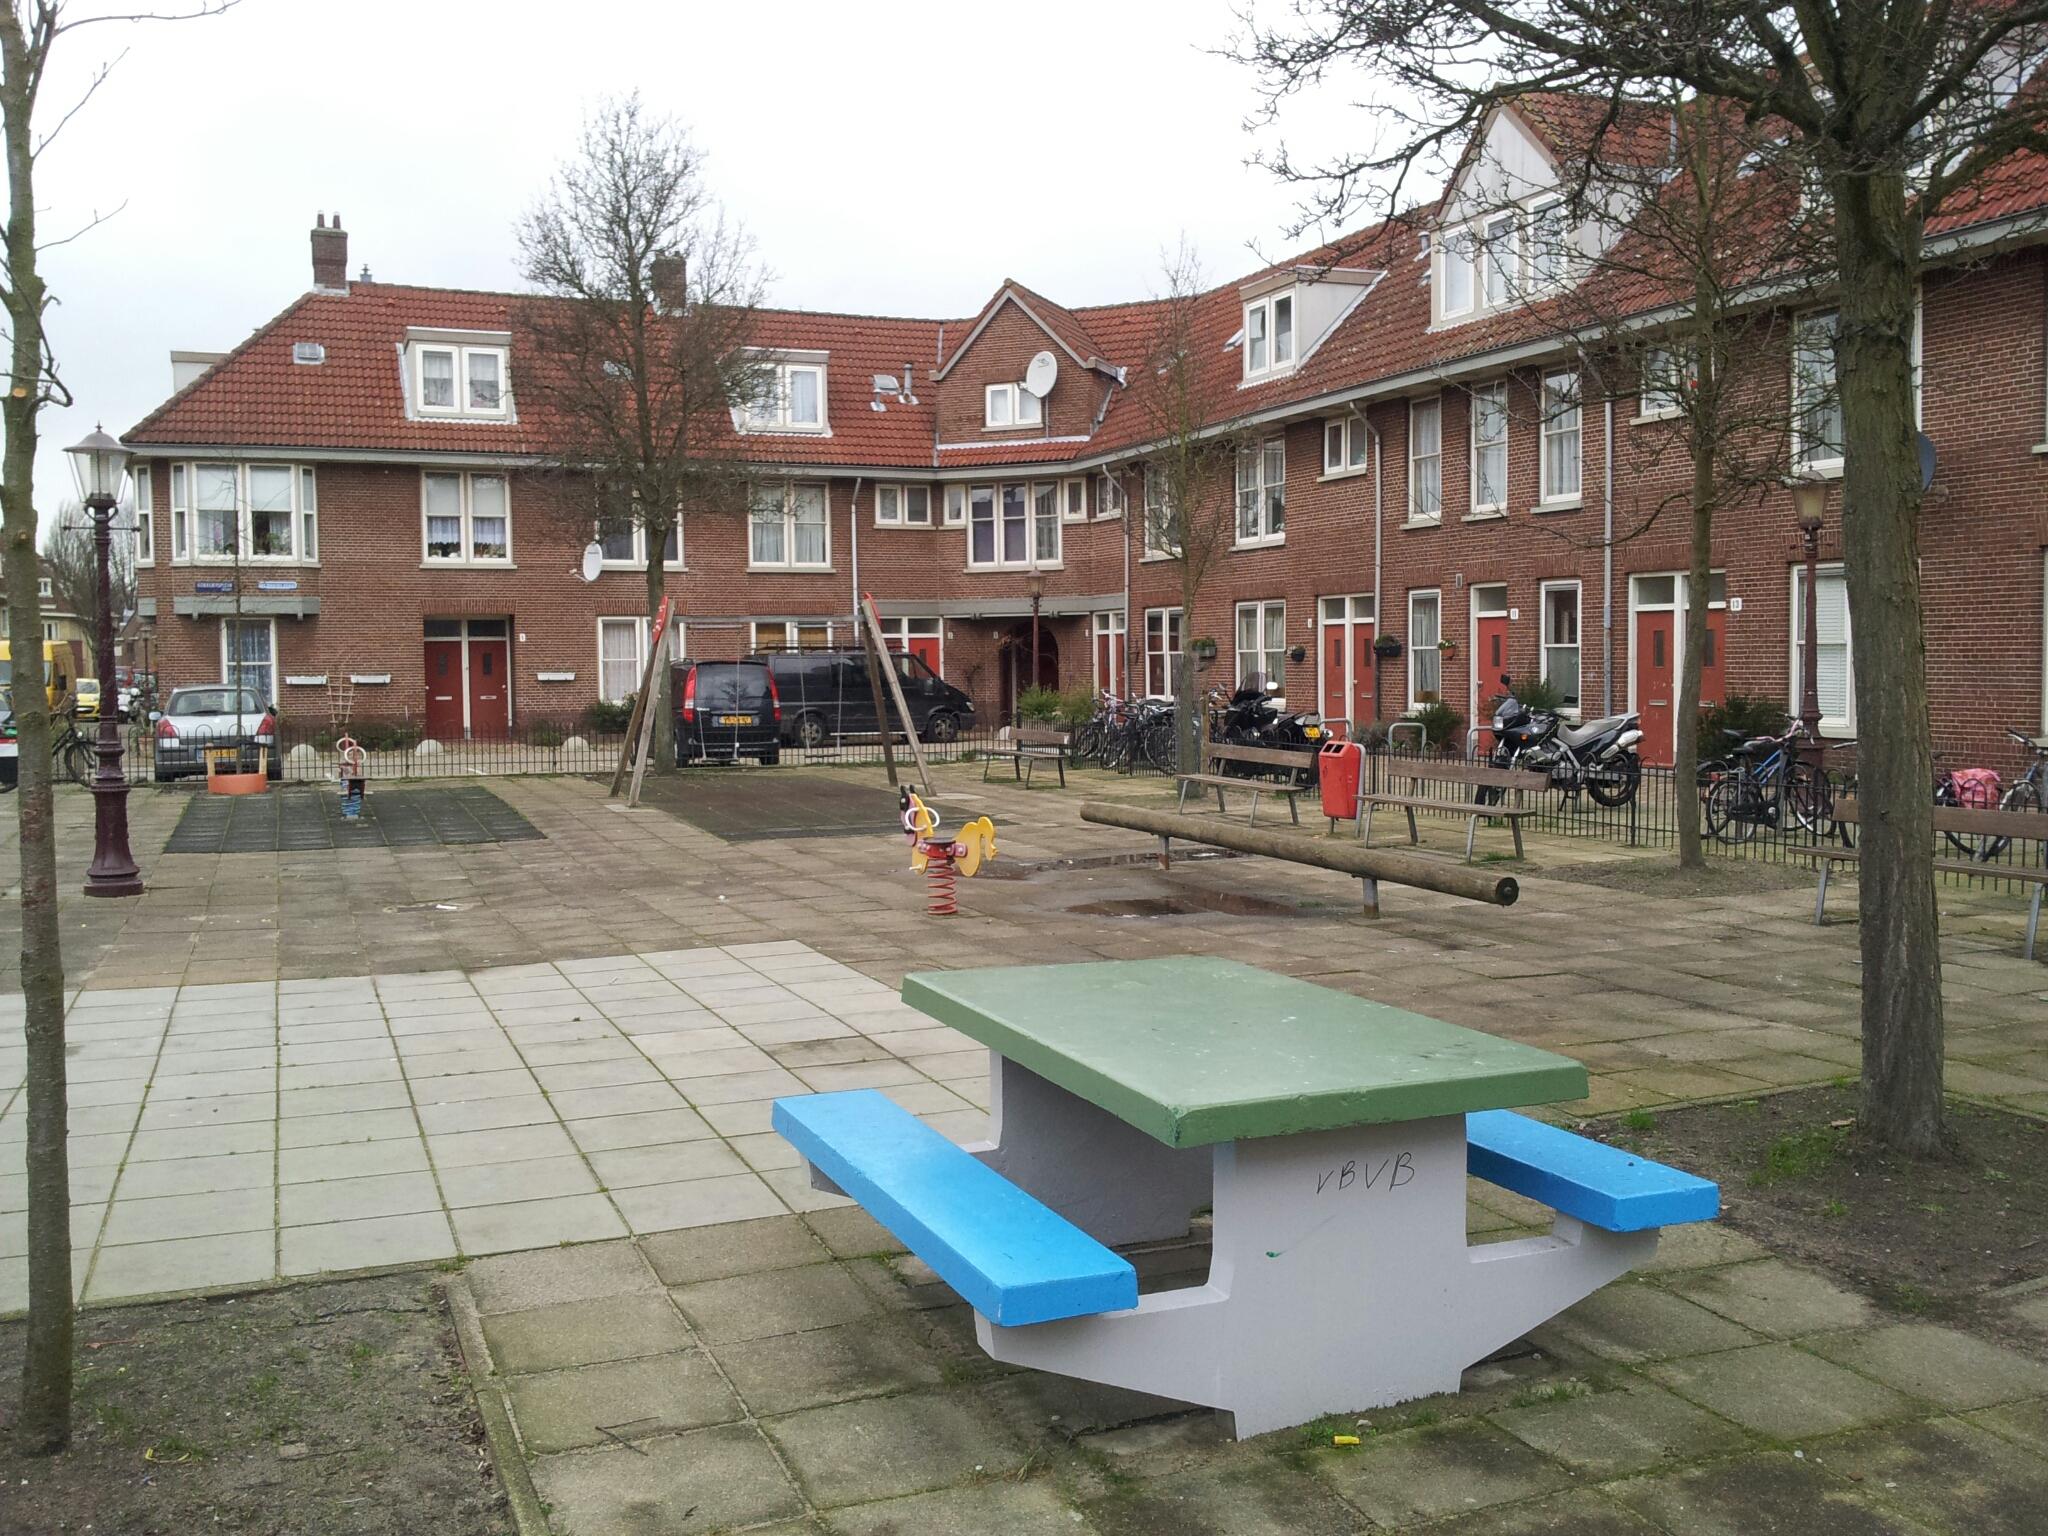 File:Koekoeksplein 1-13, Amsterdam.jpg